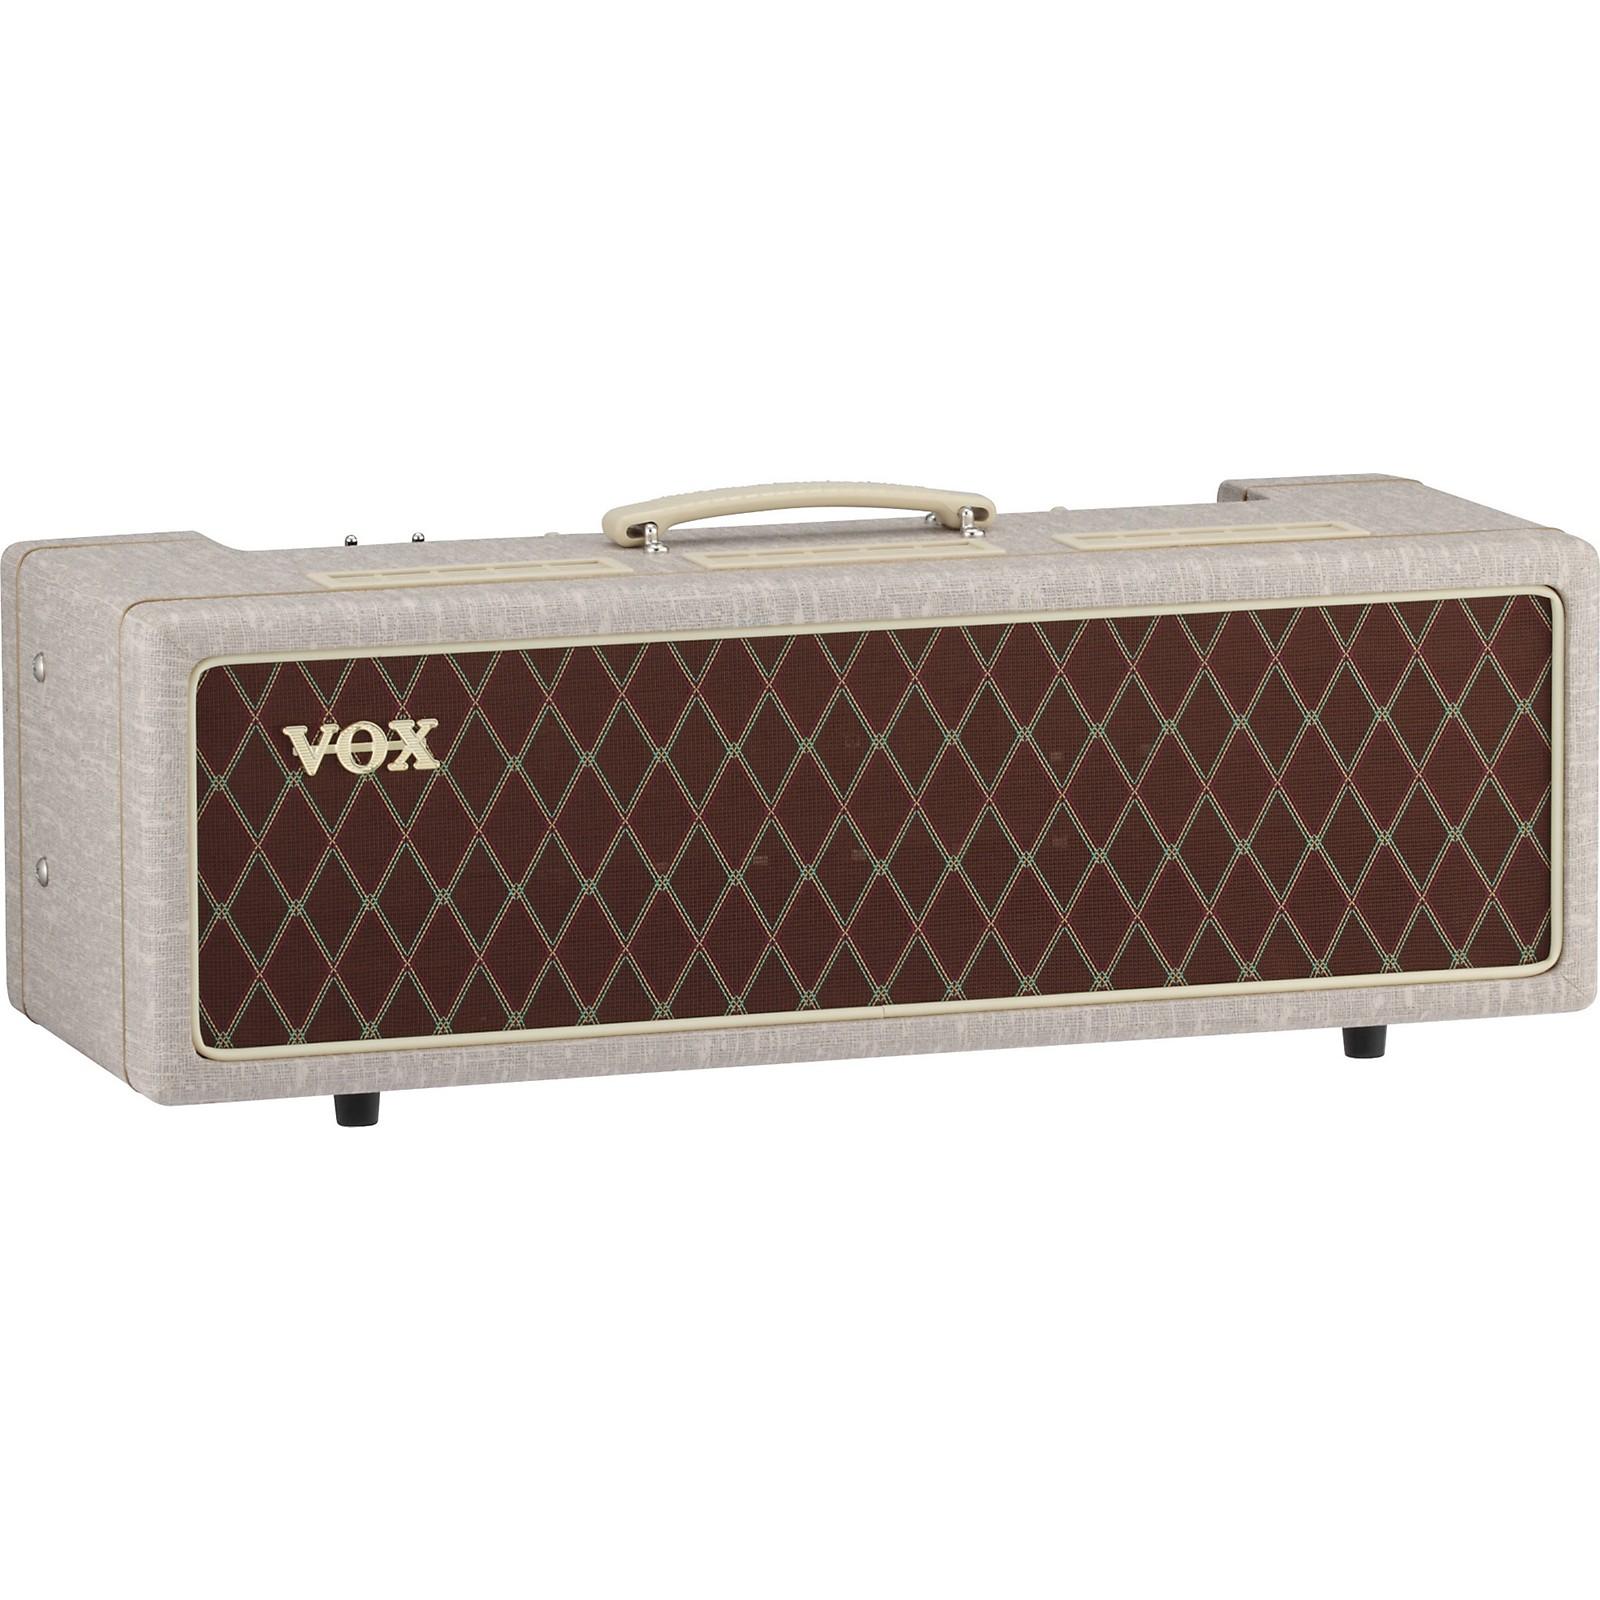 Vox Hand-Wired AC30HWHD 30W Tube Guitar Amp Head